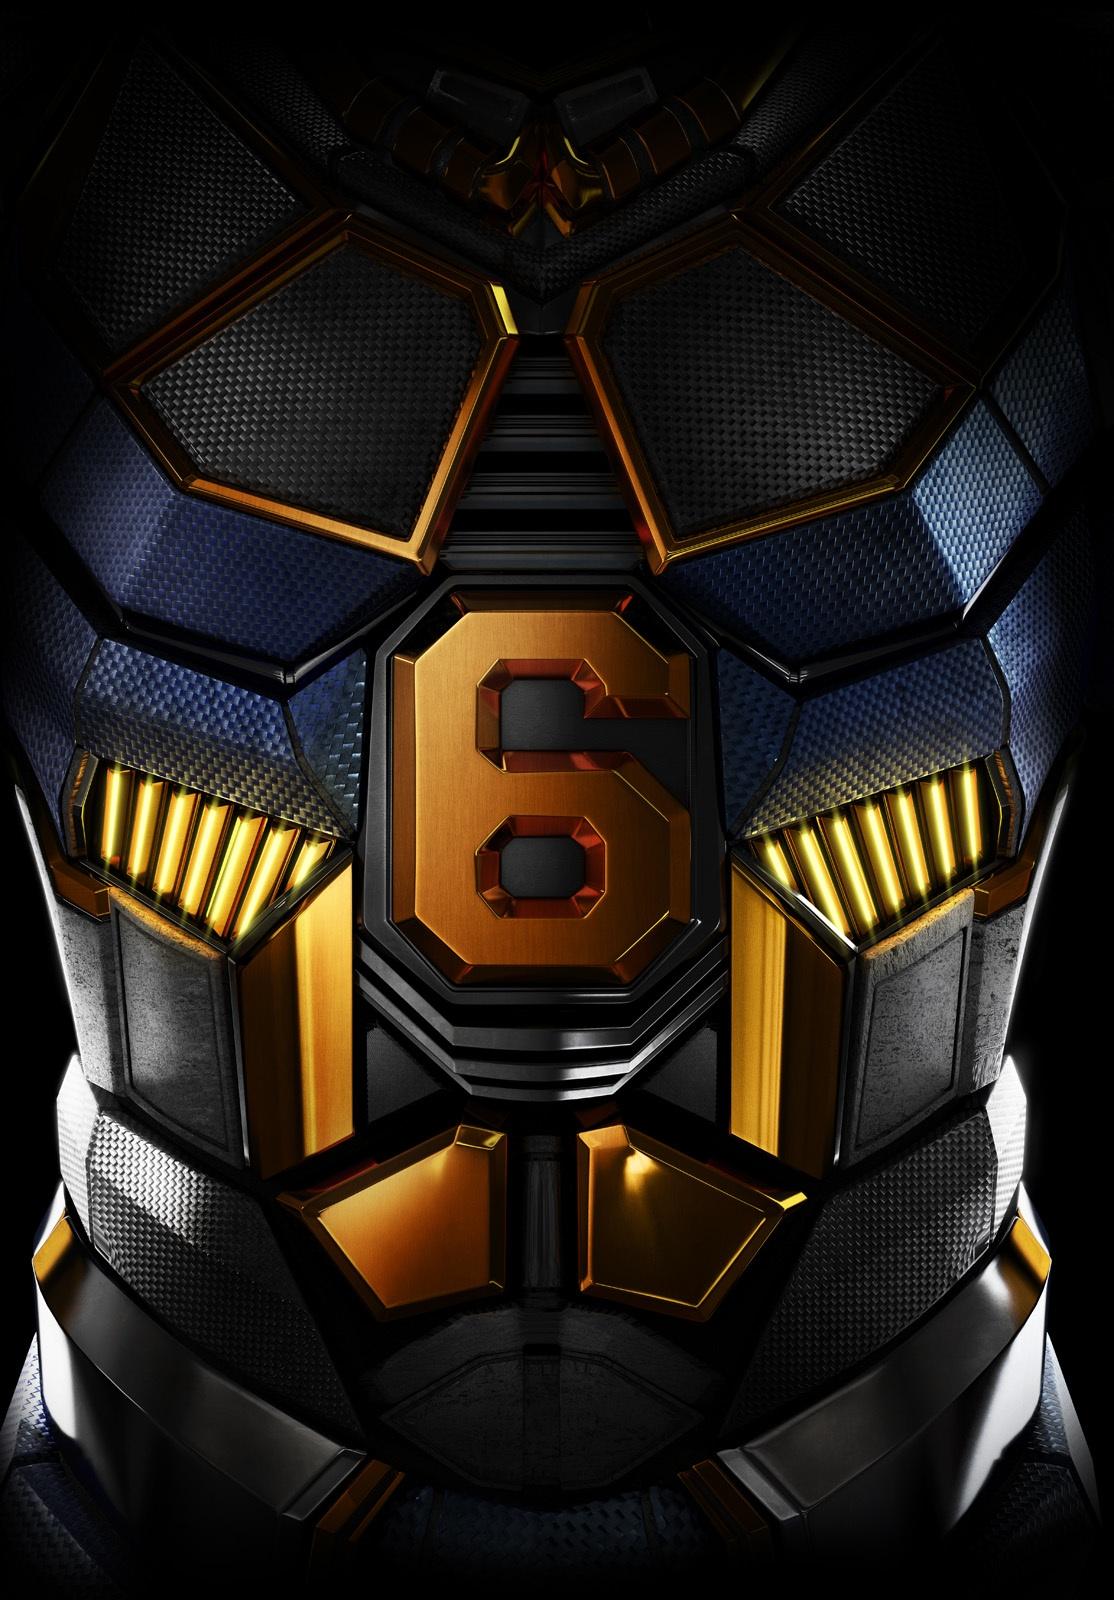 NBA_Lebron_Suit_Teaser_HFR1.jpg